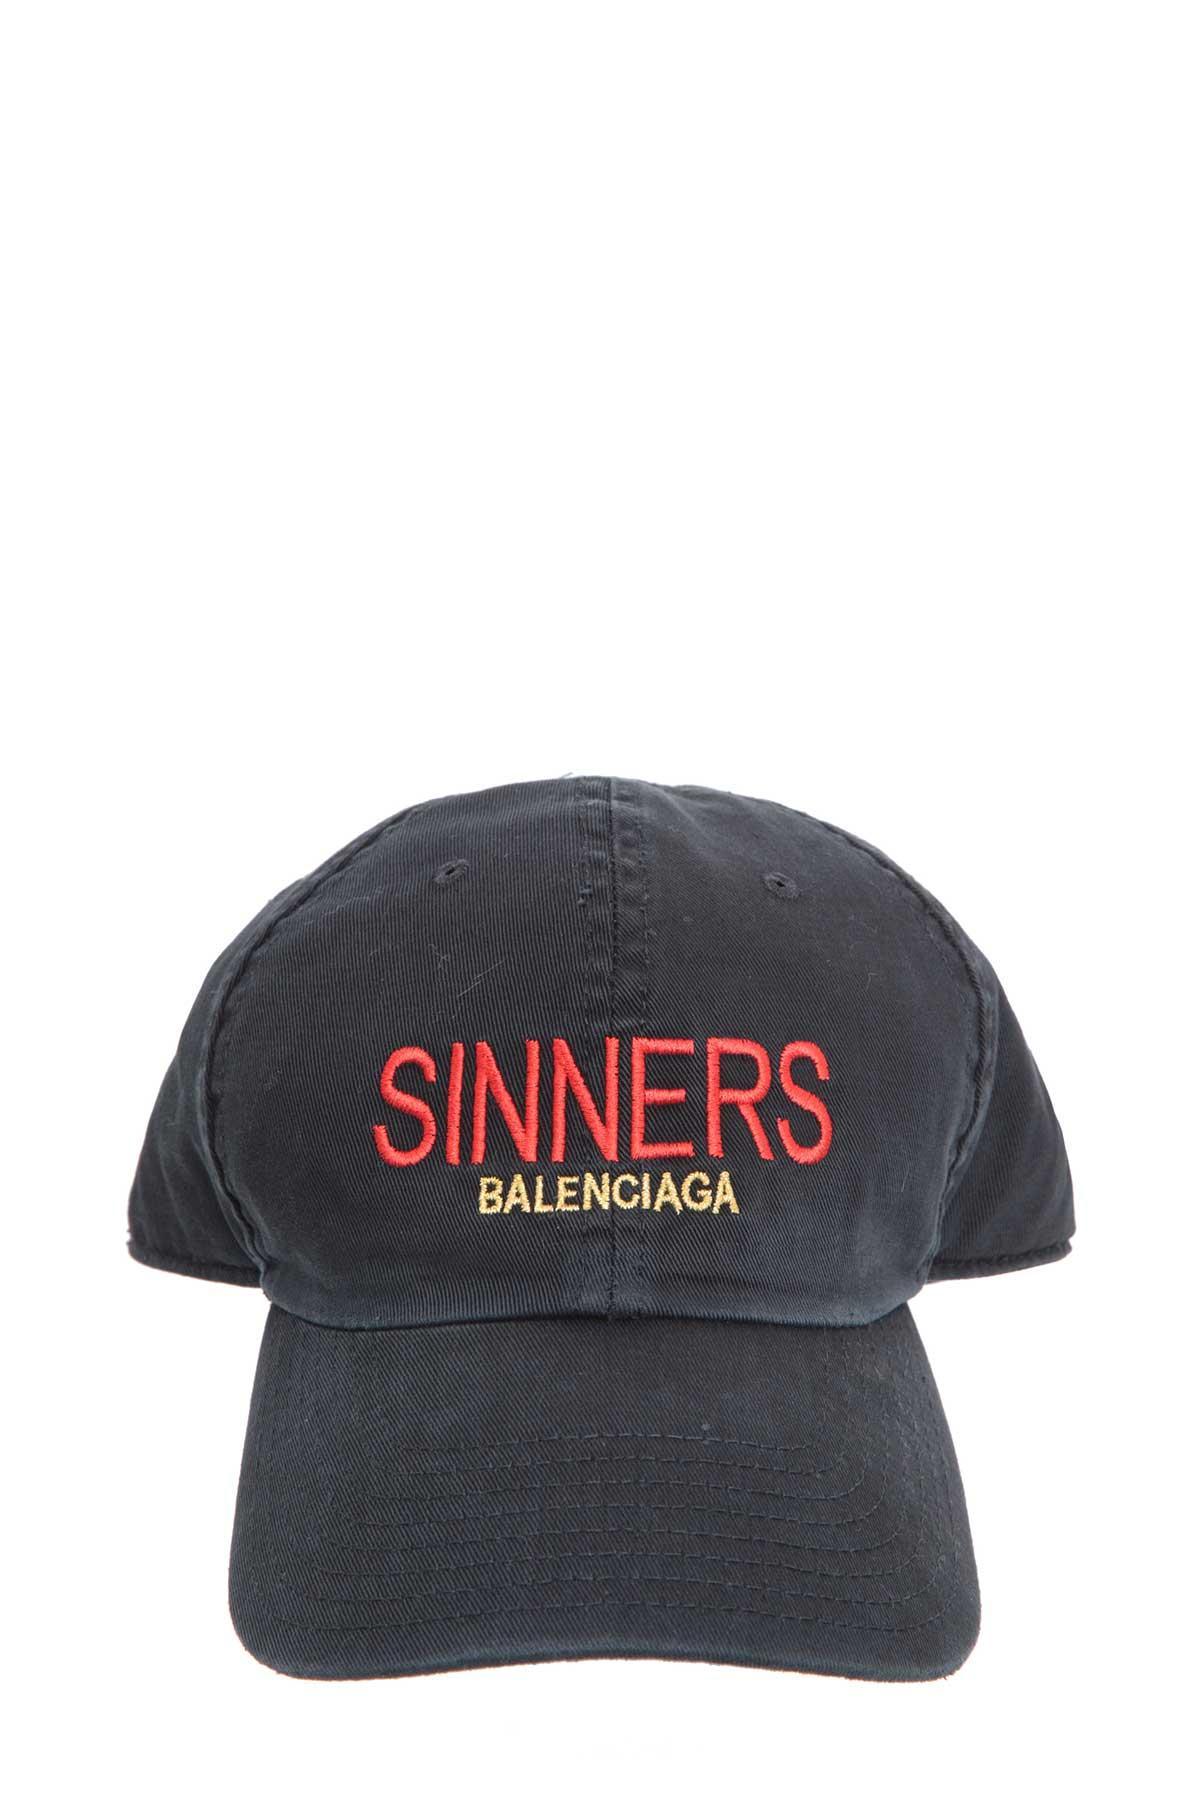 e8d45291 Balenciaga Sinners Embroidered Cotton-Twill Baseball Cap - Black - One Siz